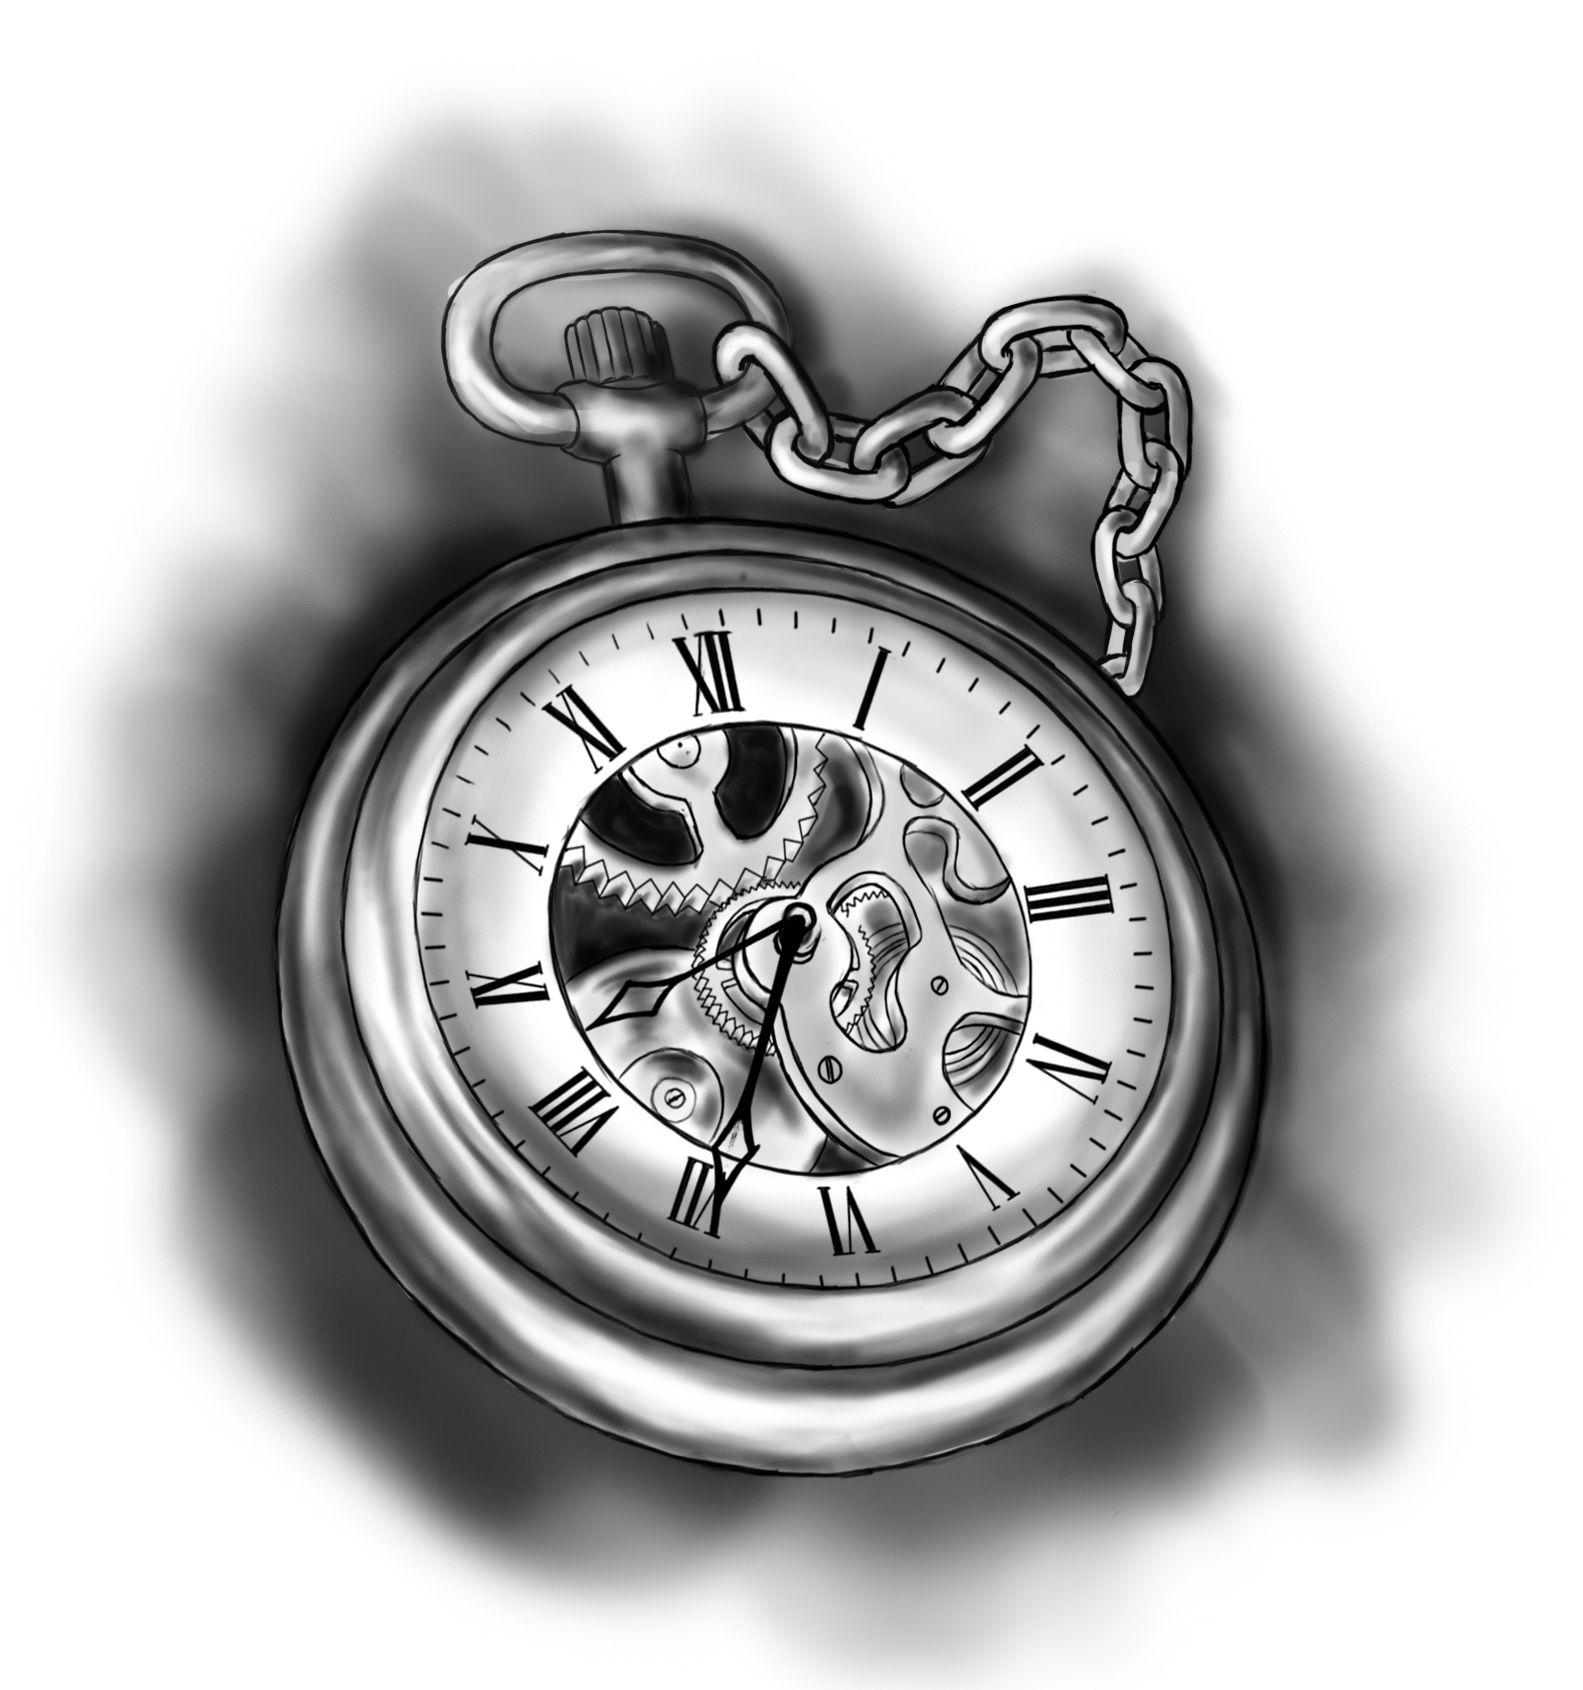 Artwork tattoo designs free tattoo website template best tattoo - Pocket Watch Drawing Www Galleryhip Com The Hippest Pics